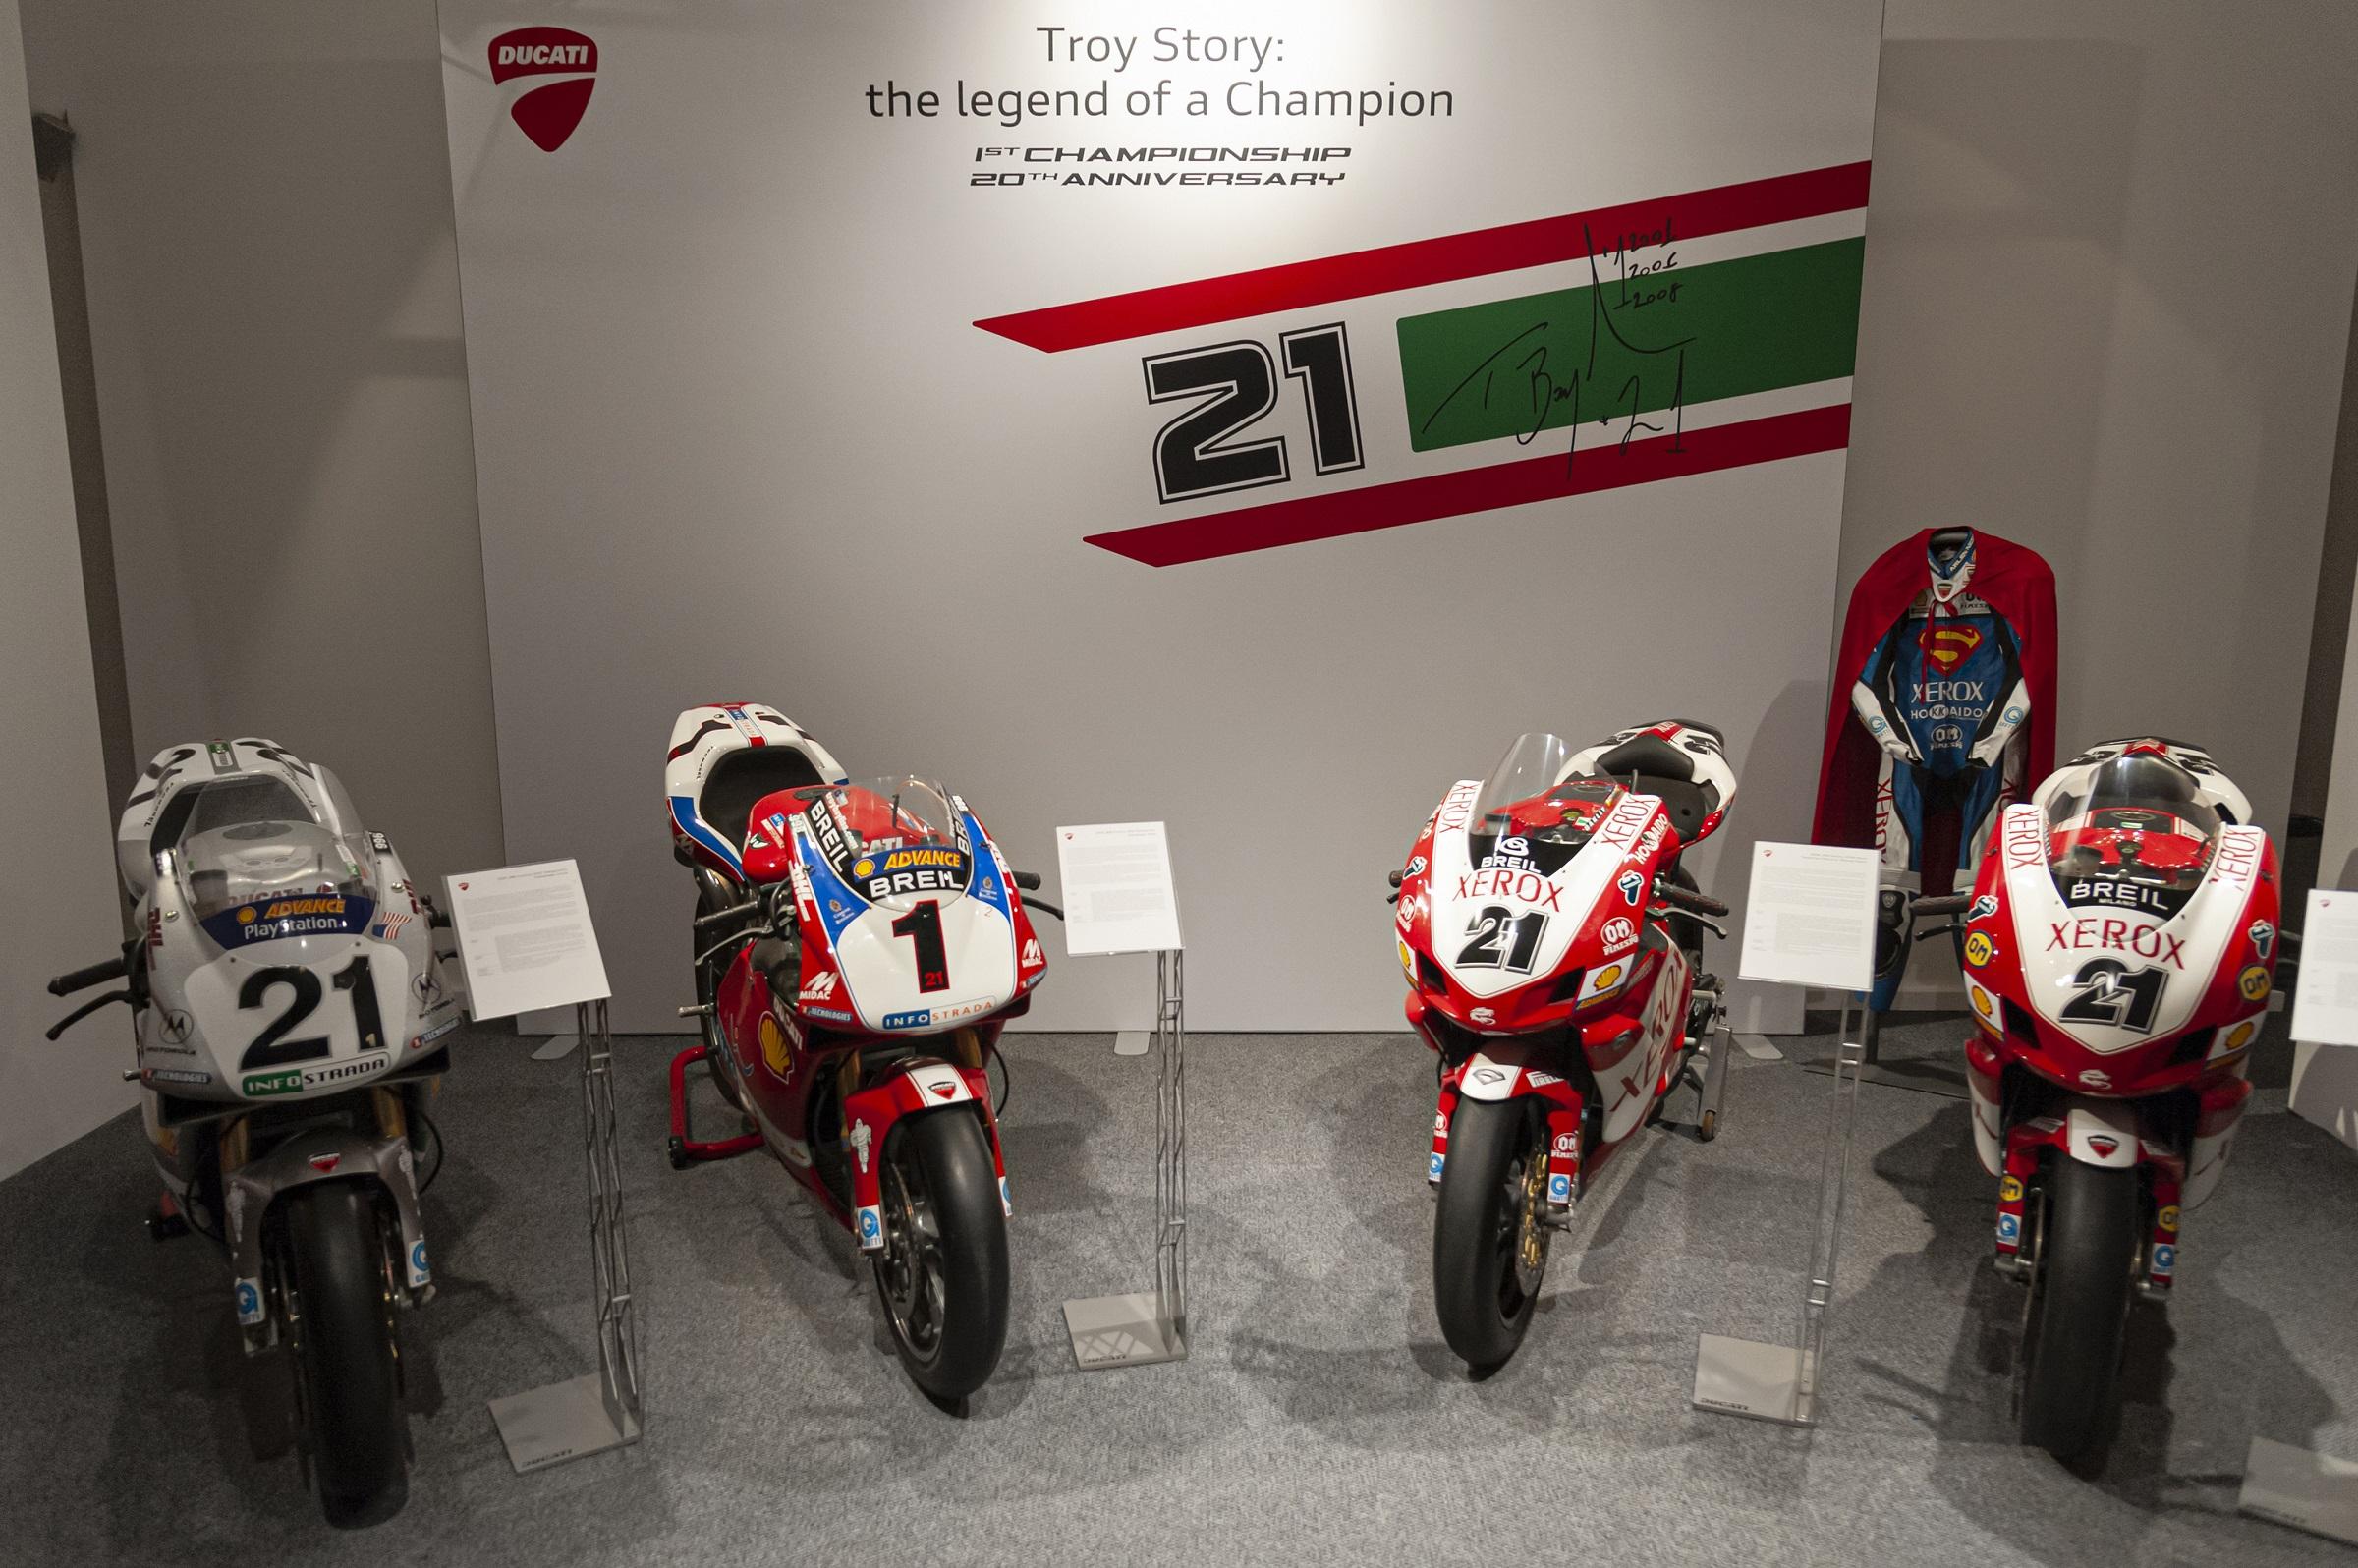 DUCATI Troy Story the Legend of a Champion 3 Μουσείο Ducati : Θεματική έκθεση για τα 20 χρόνια από τον πρώτο παγκόσμιο τίτλο του Troy Bayliss Ducati, ειδήσεις, Νέα